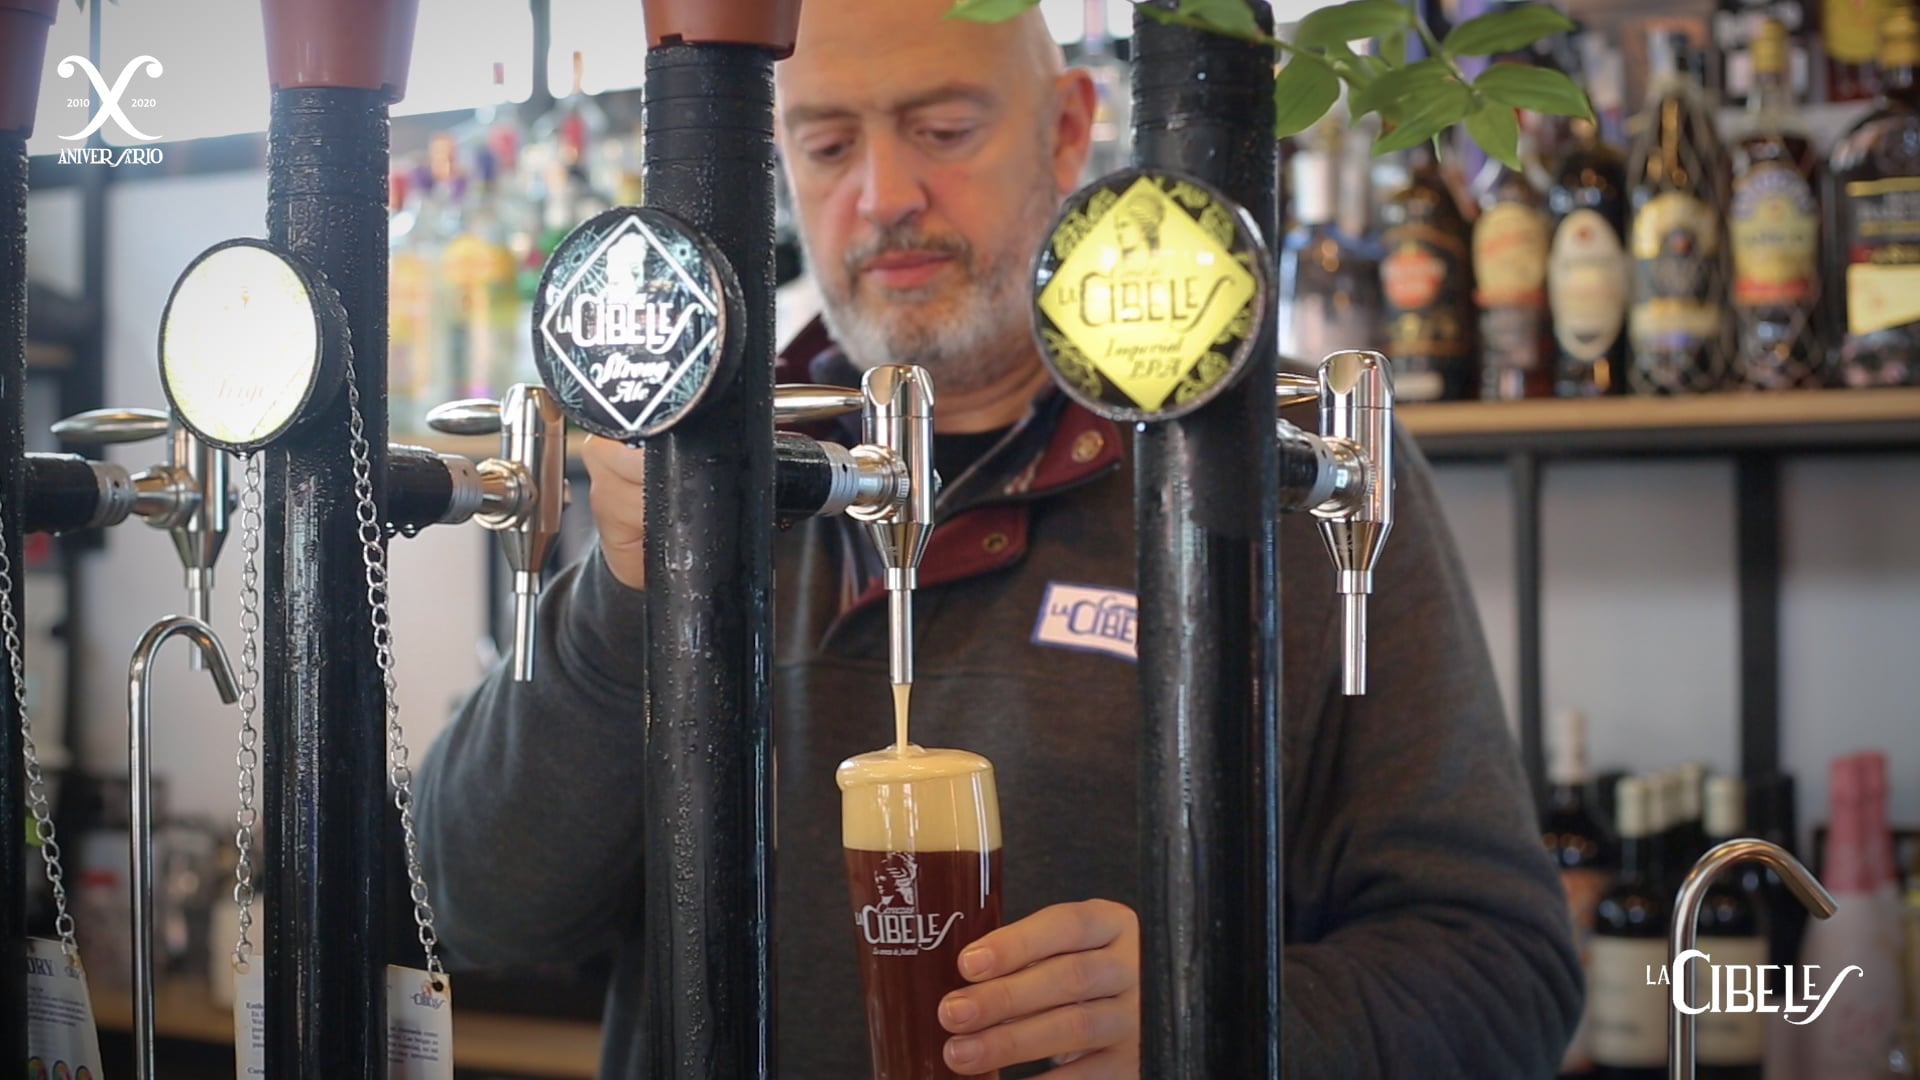 Grifos Cervezas La Cibeles